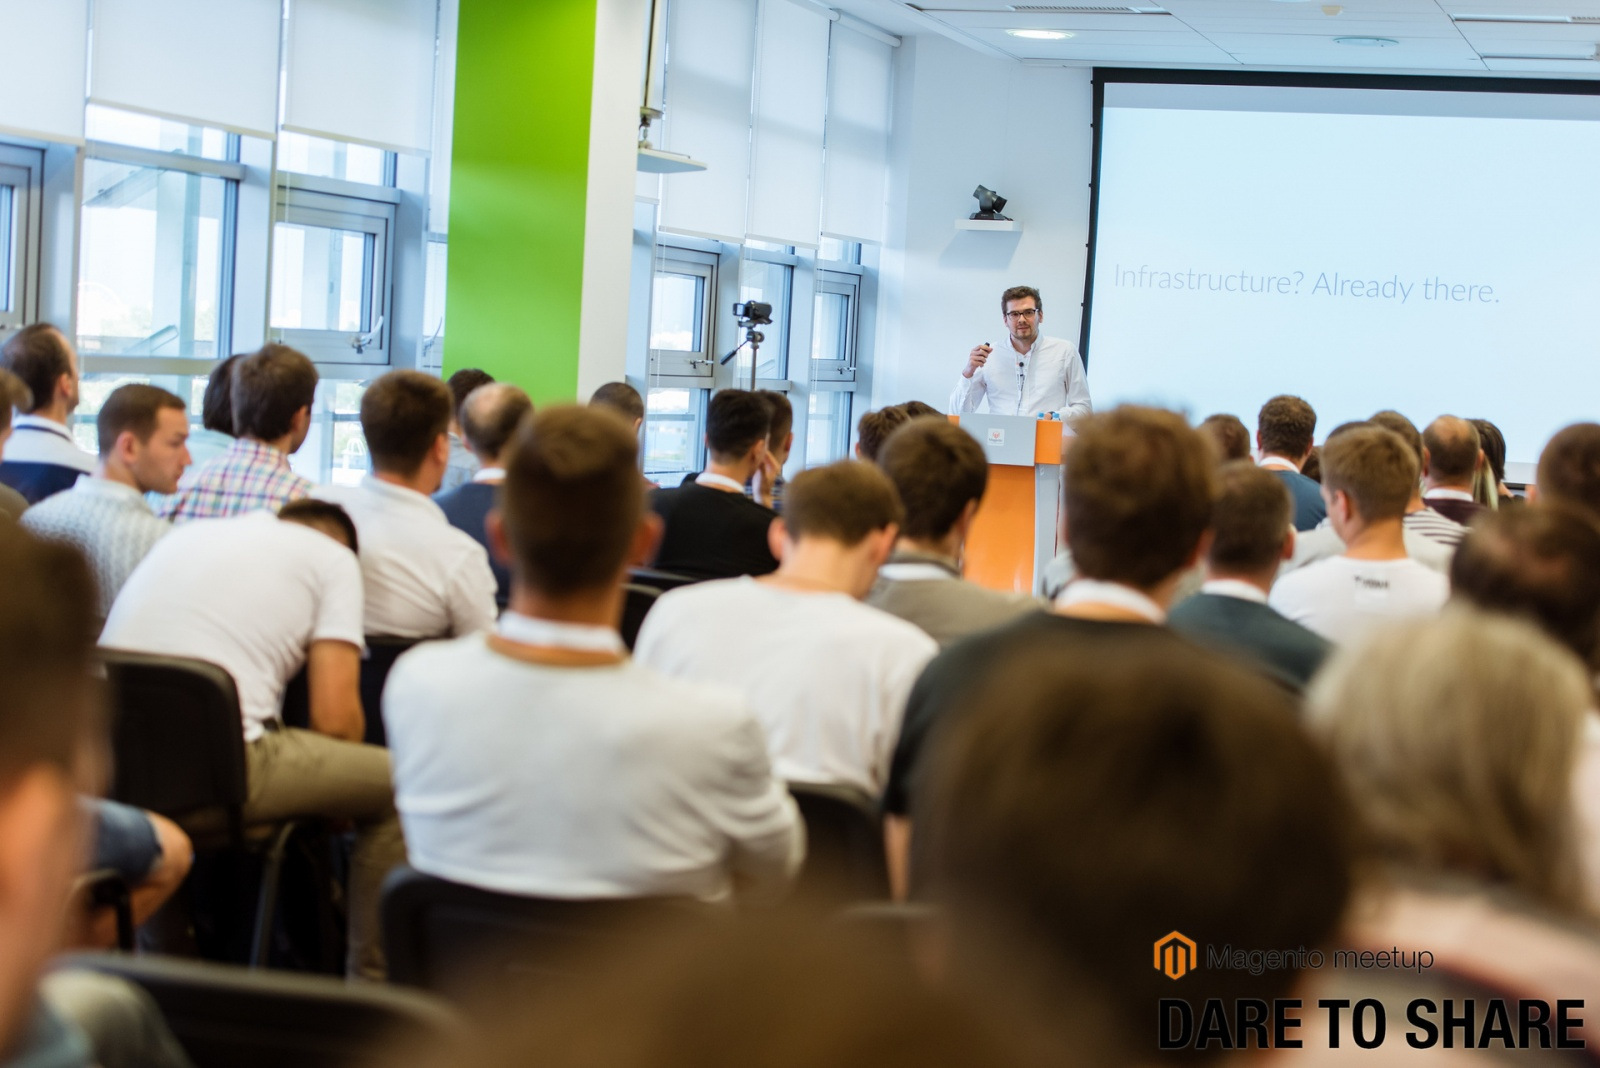 Magento Dare to Share — Открытая Площадка для докладов о Magento, PHP и eCommerce - 1